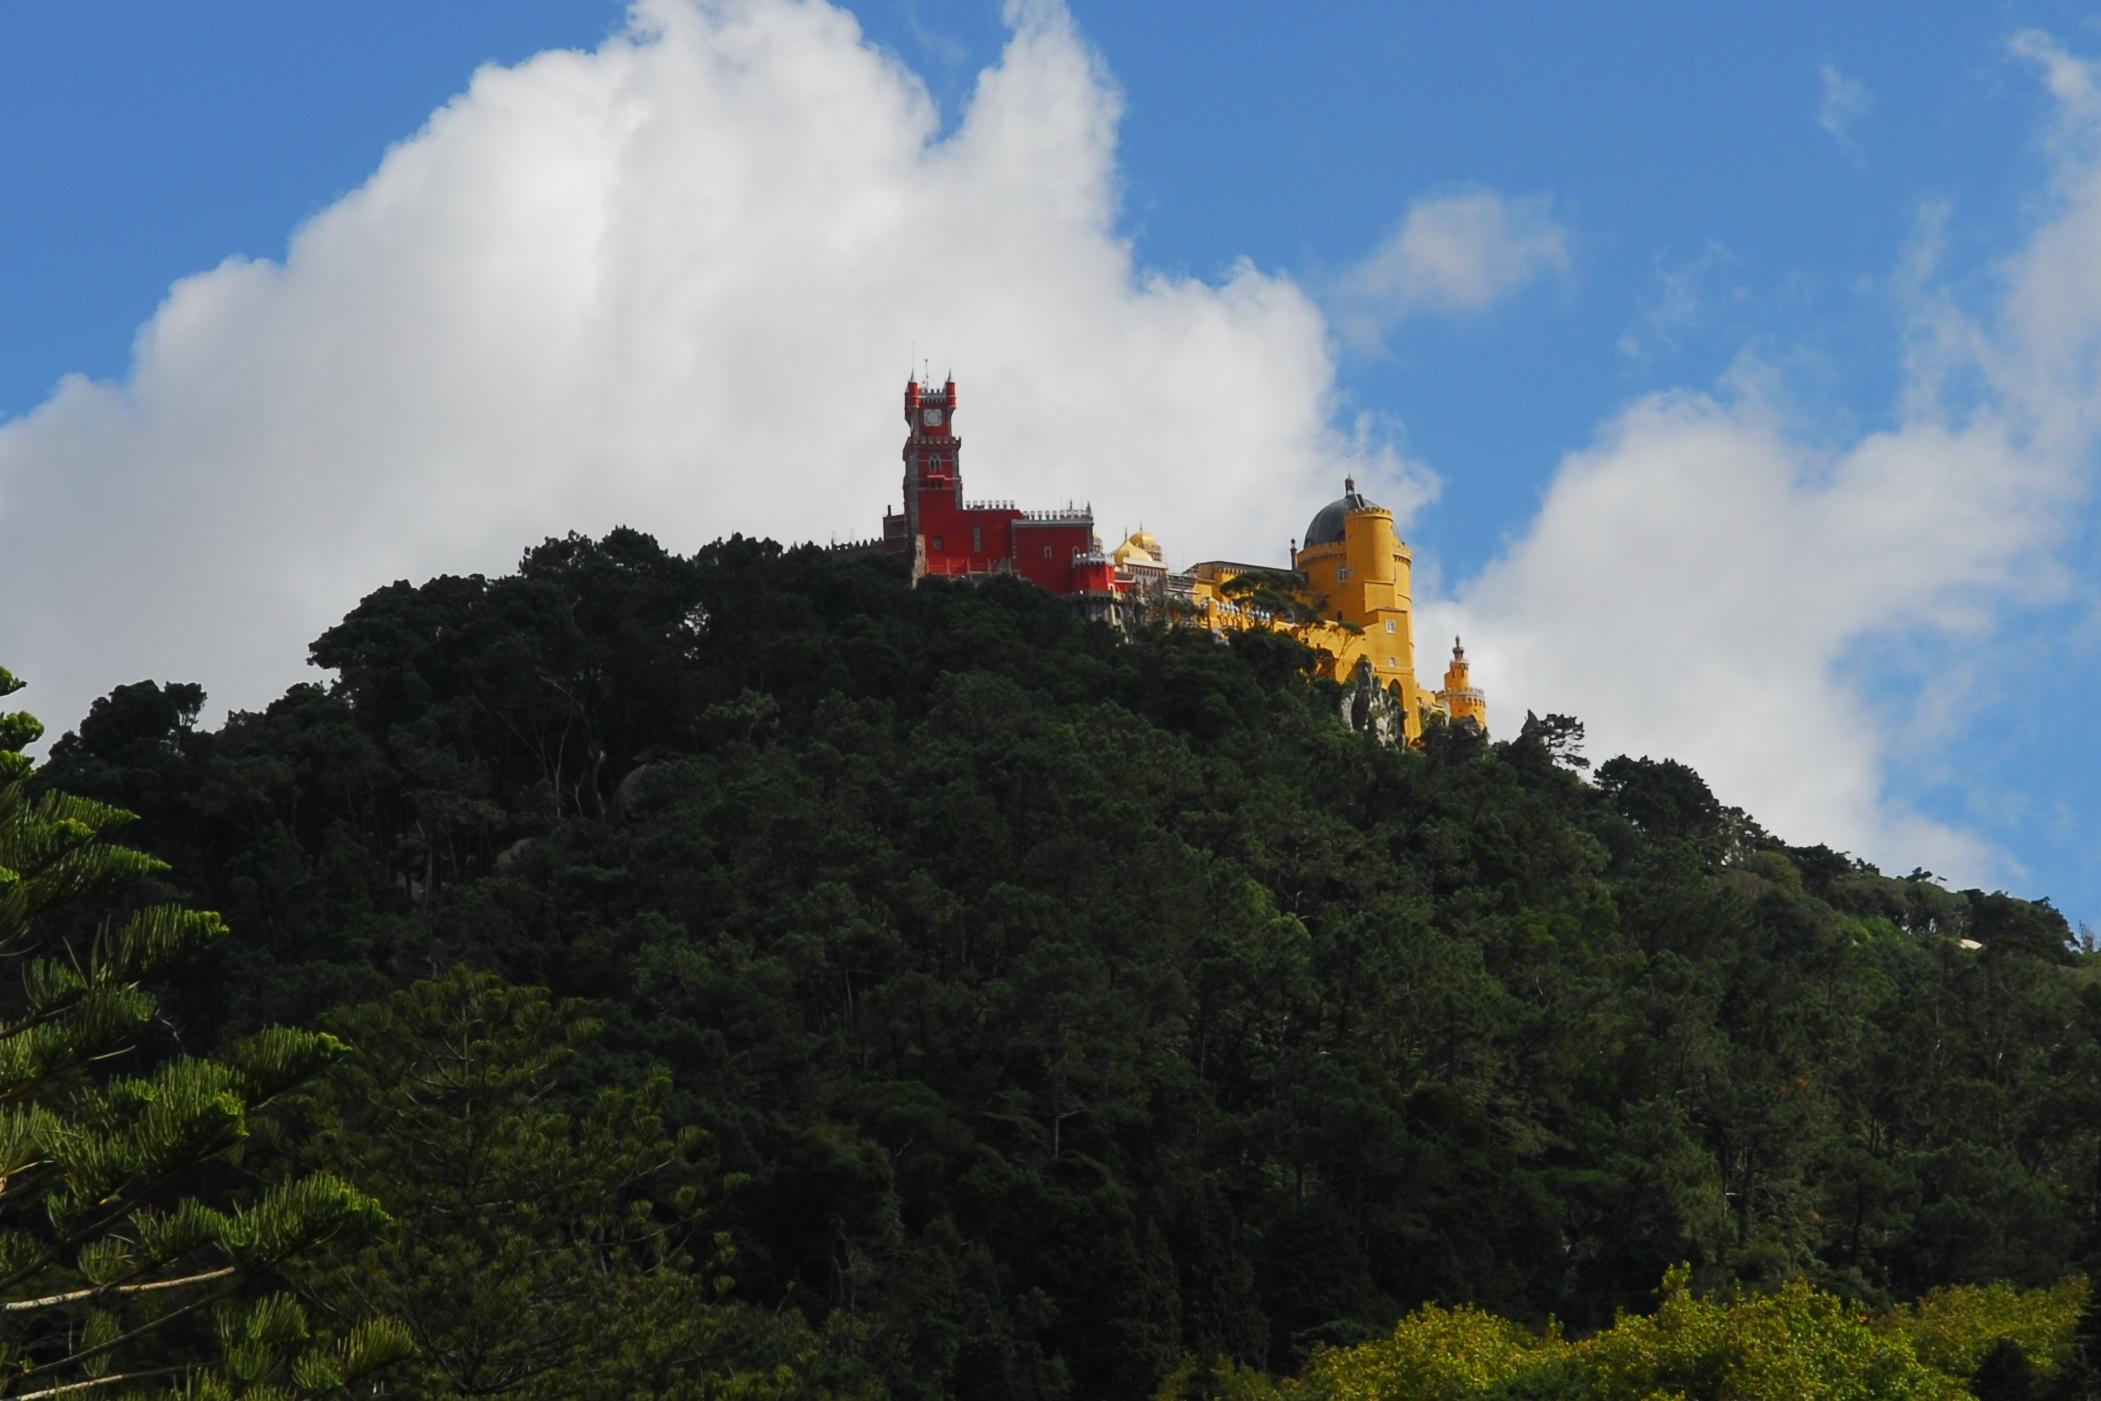 Palácio Nacional da Pena von Quinta da Regaleira aus gesehen